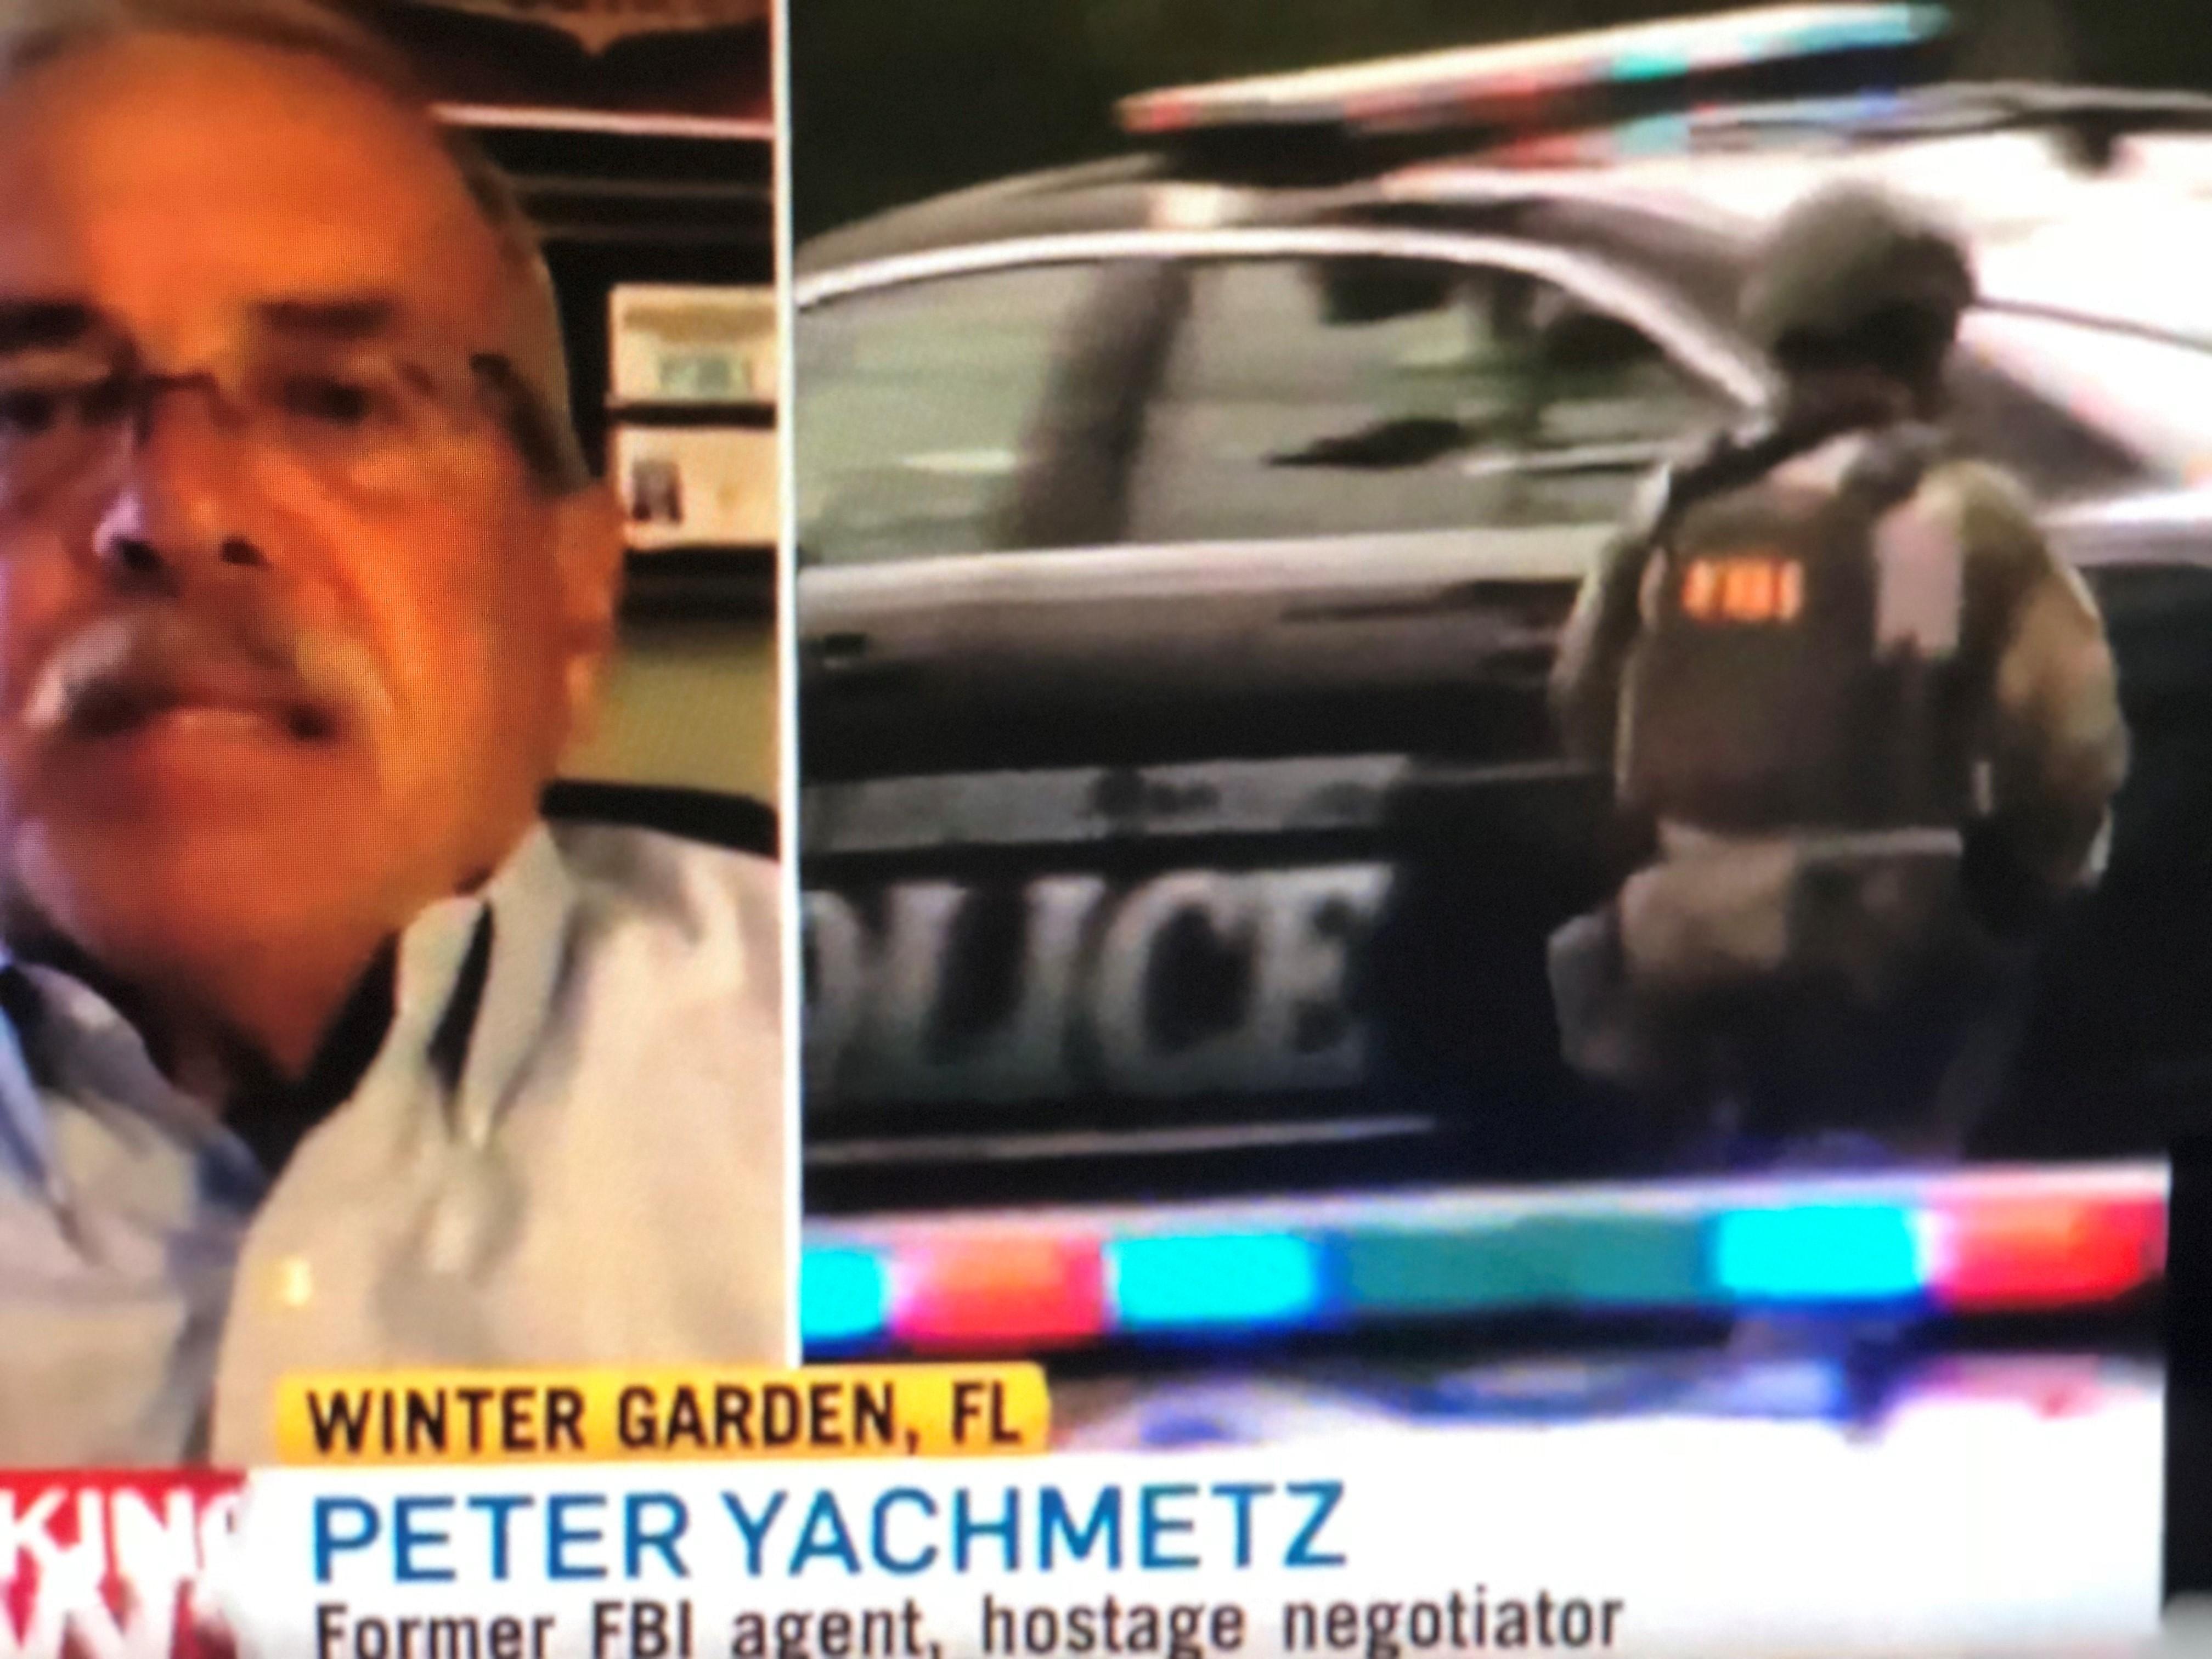 Pete D Yachmetz - School Security